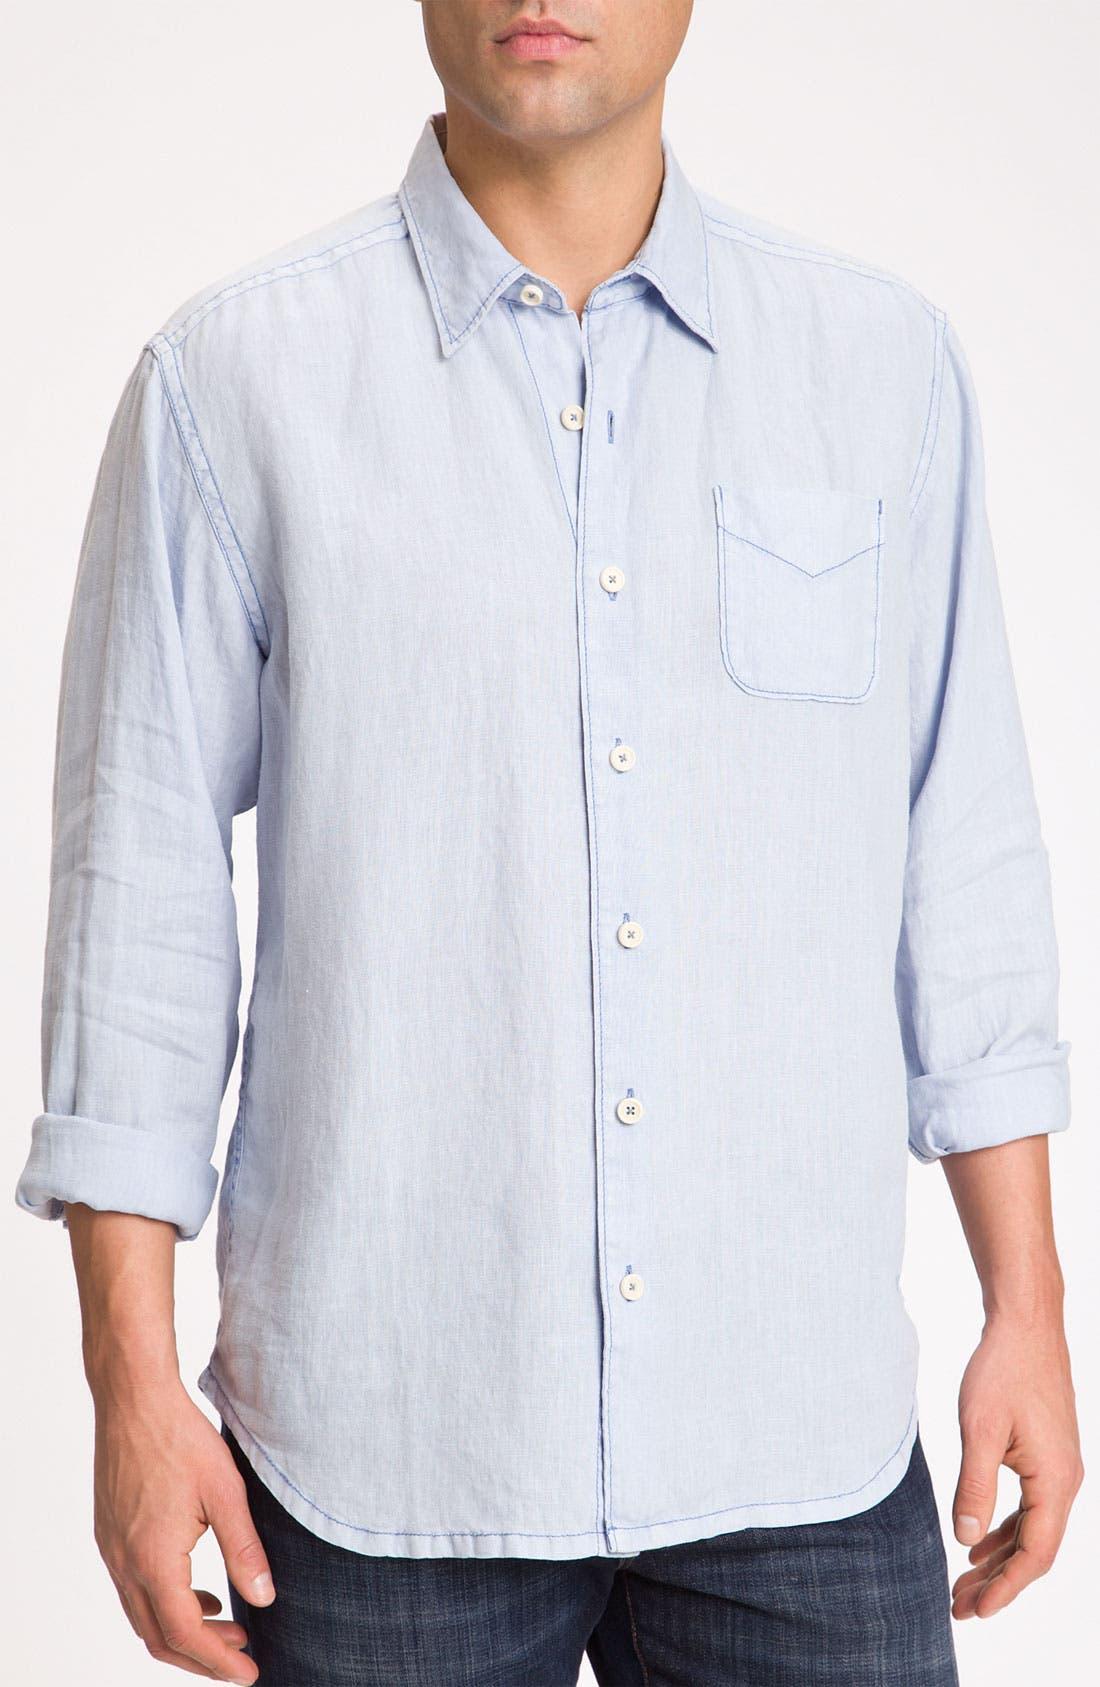 Main Image - Tommy Bahama 'Beachy Breezer' Linen Sport Shirt (Big & Tall)